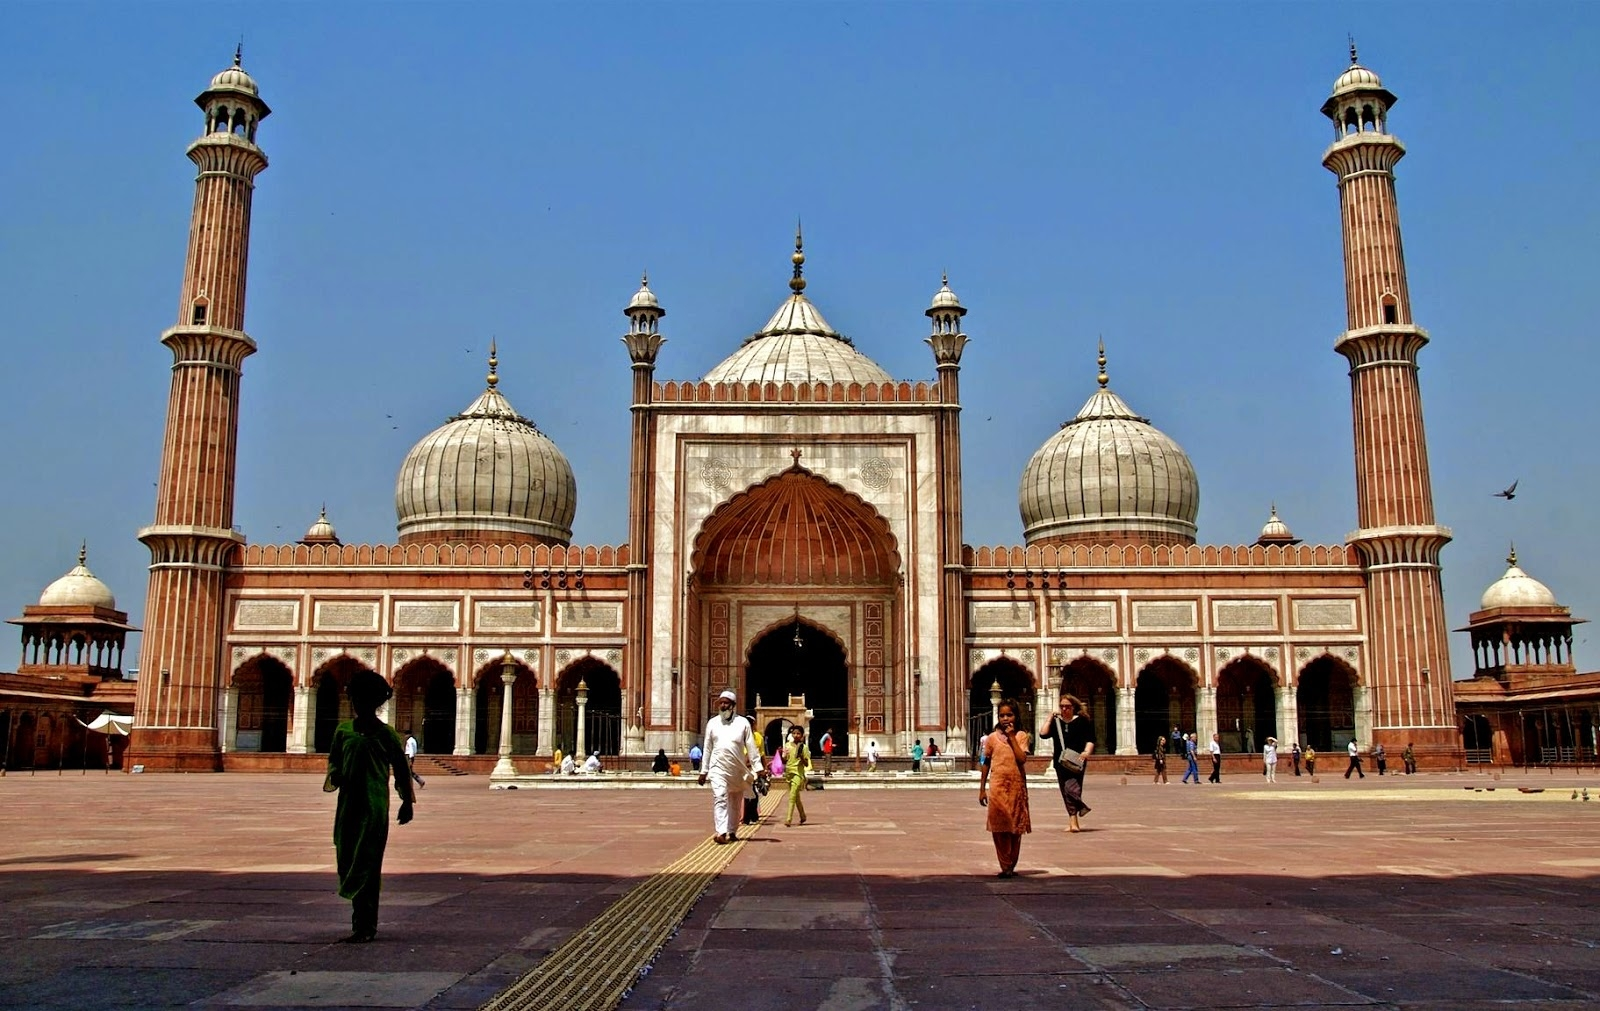 The Tajul Masjid Bhopal Tourist Guide - Holiday Travel